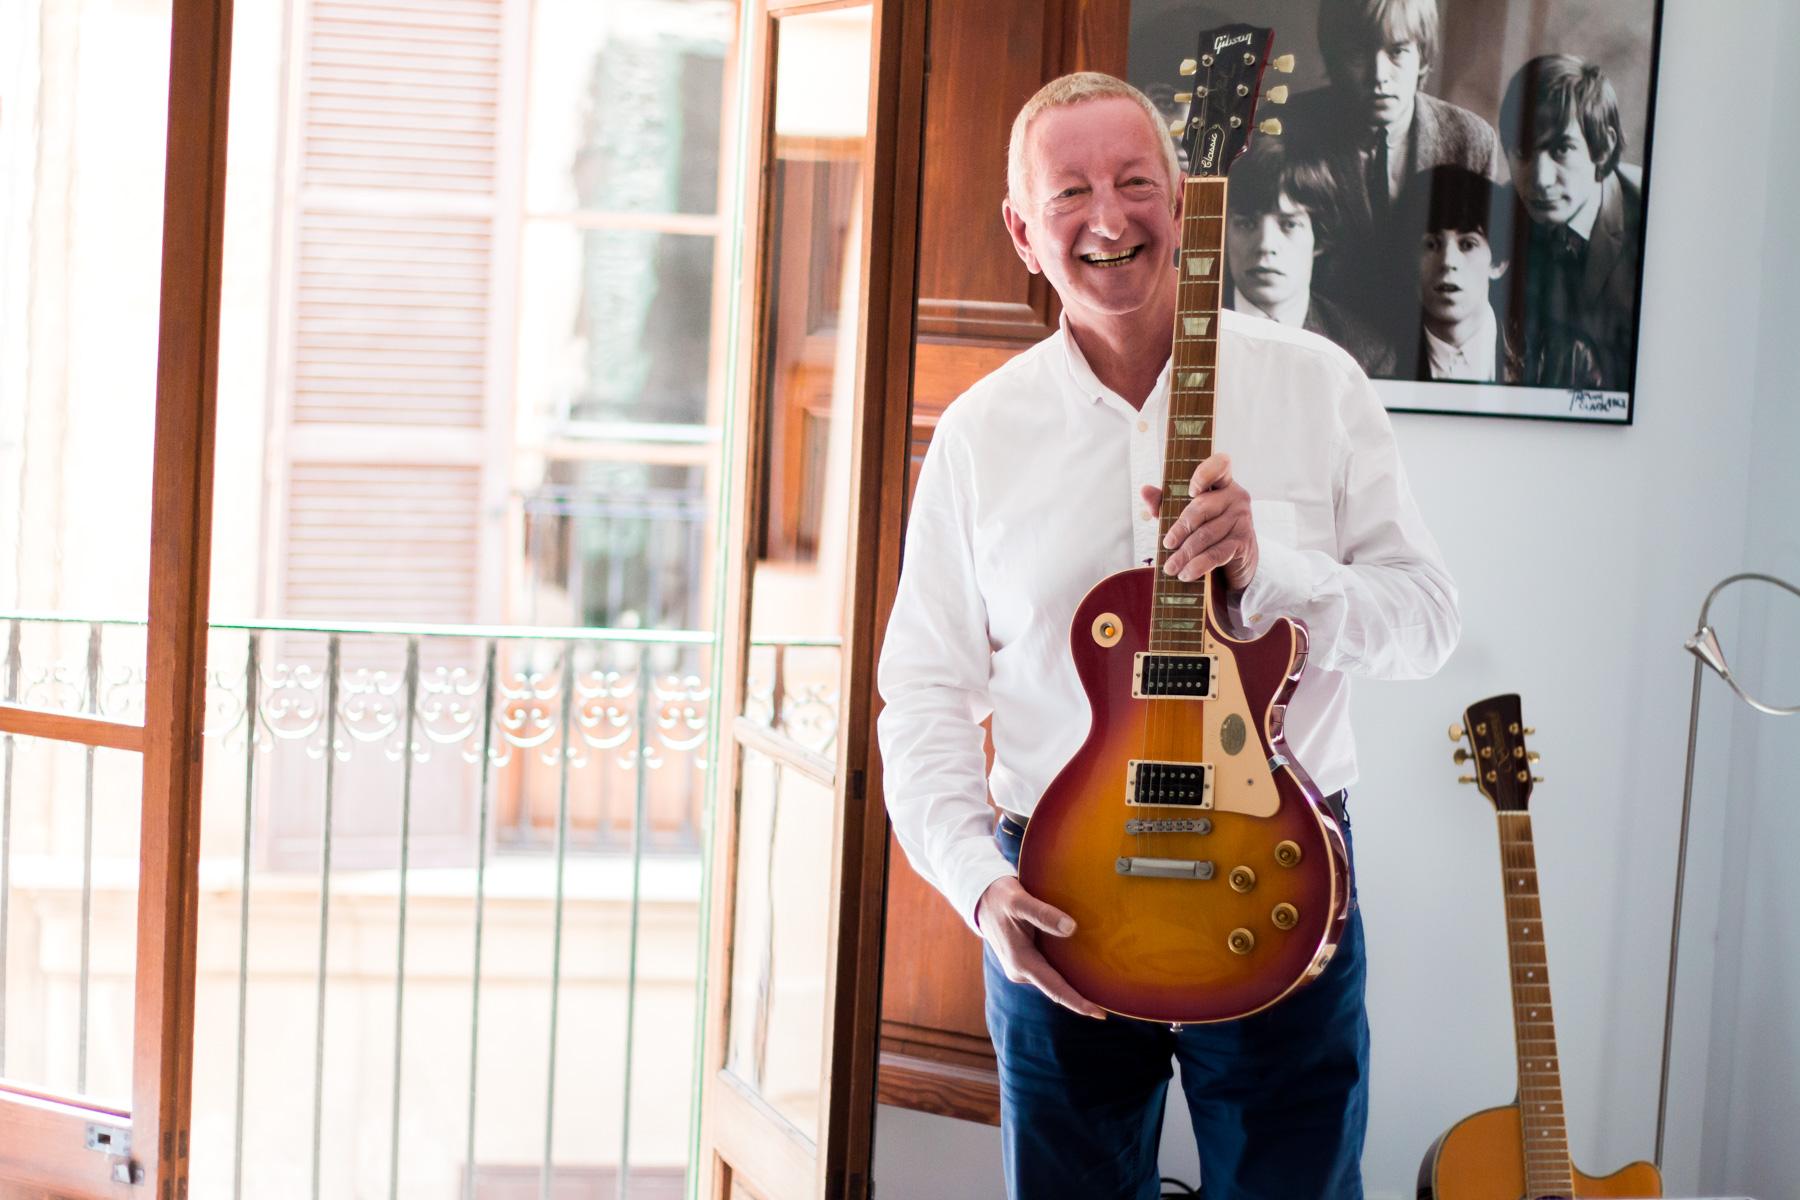 Nicks guitar, a Les Paul.